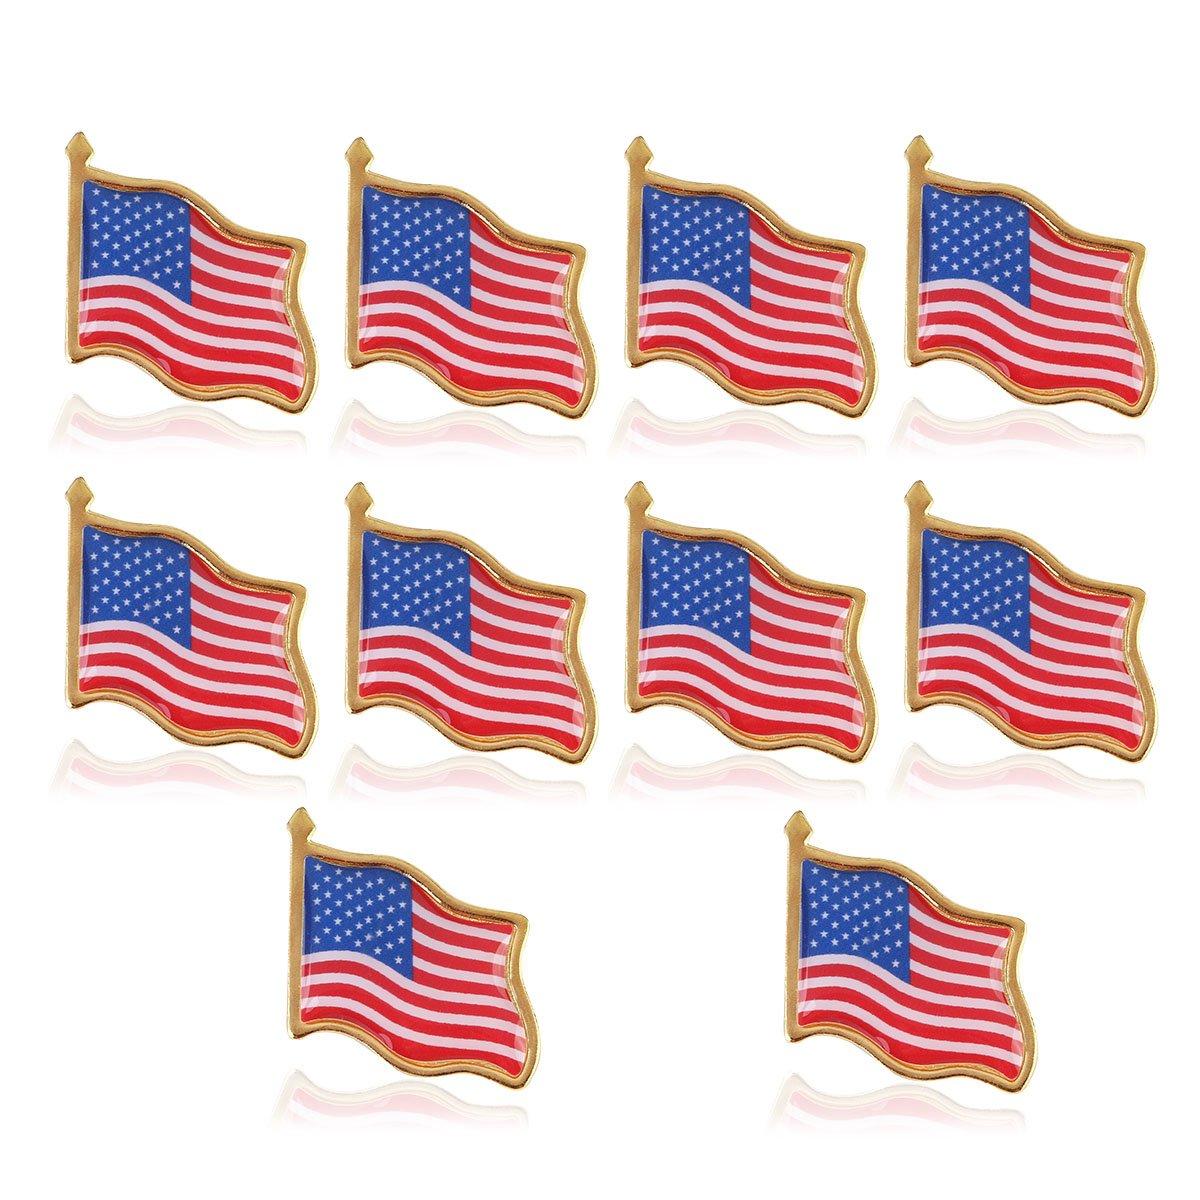 10 broches de drapeau américain UEETEK